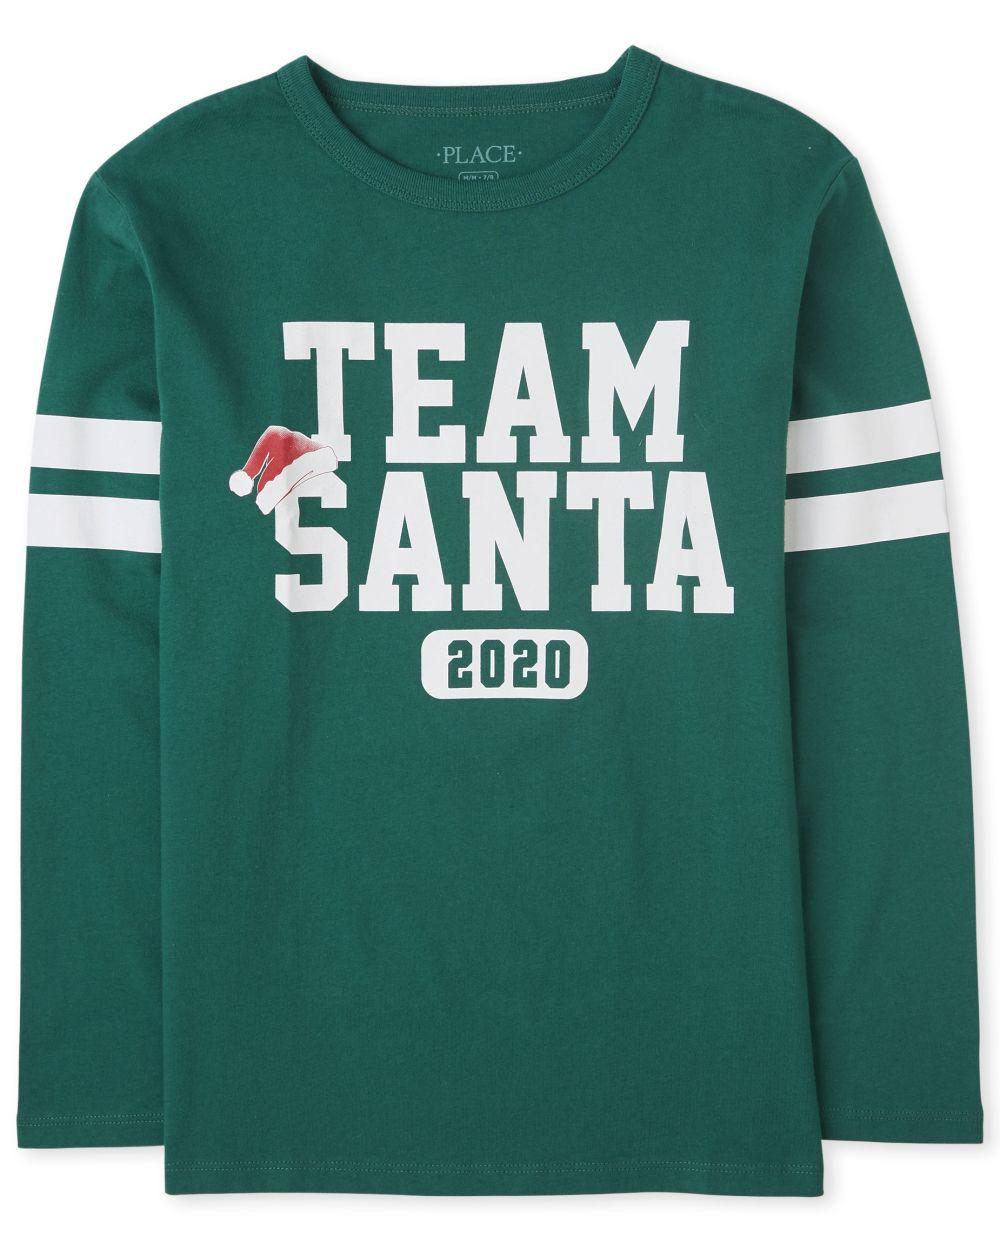 Unisex Kids Matching Family Christmas Team Santa Graphic Tee